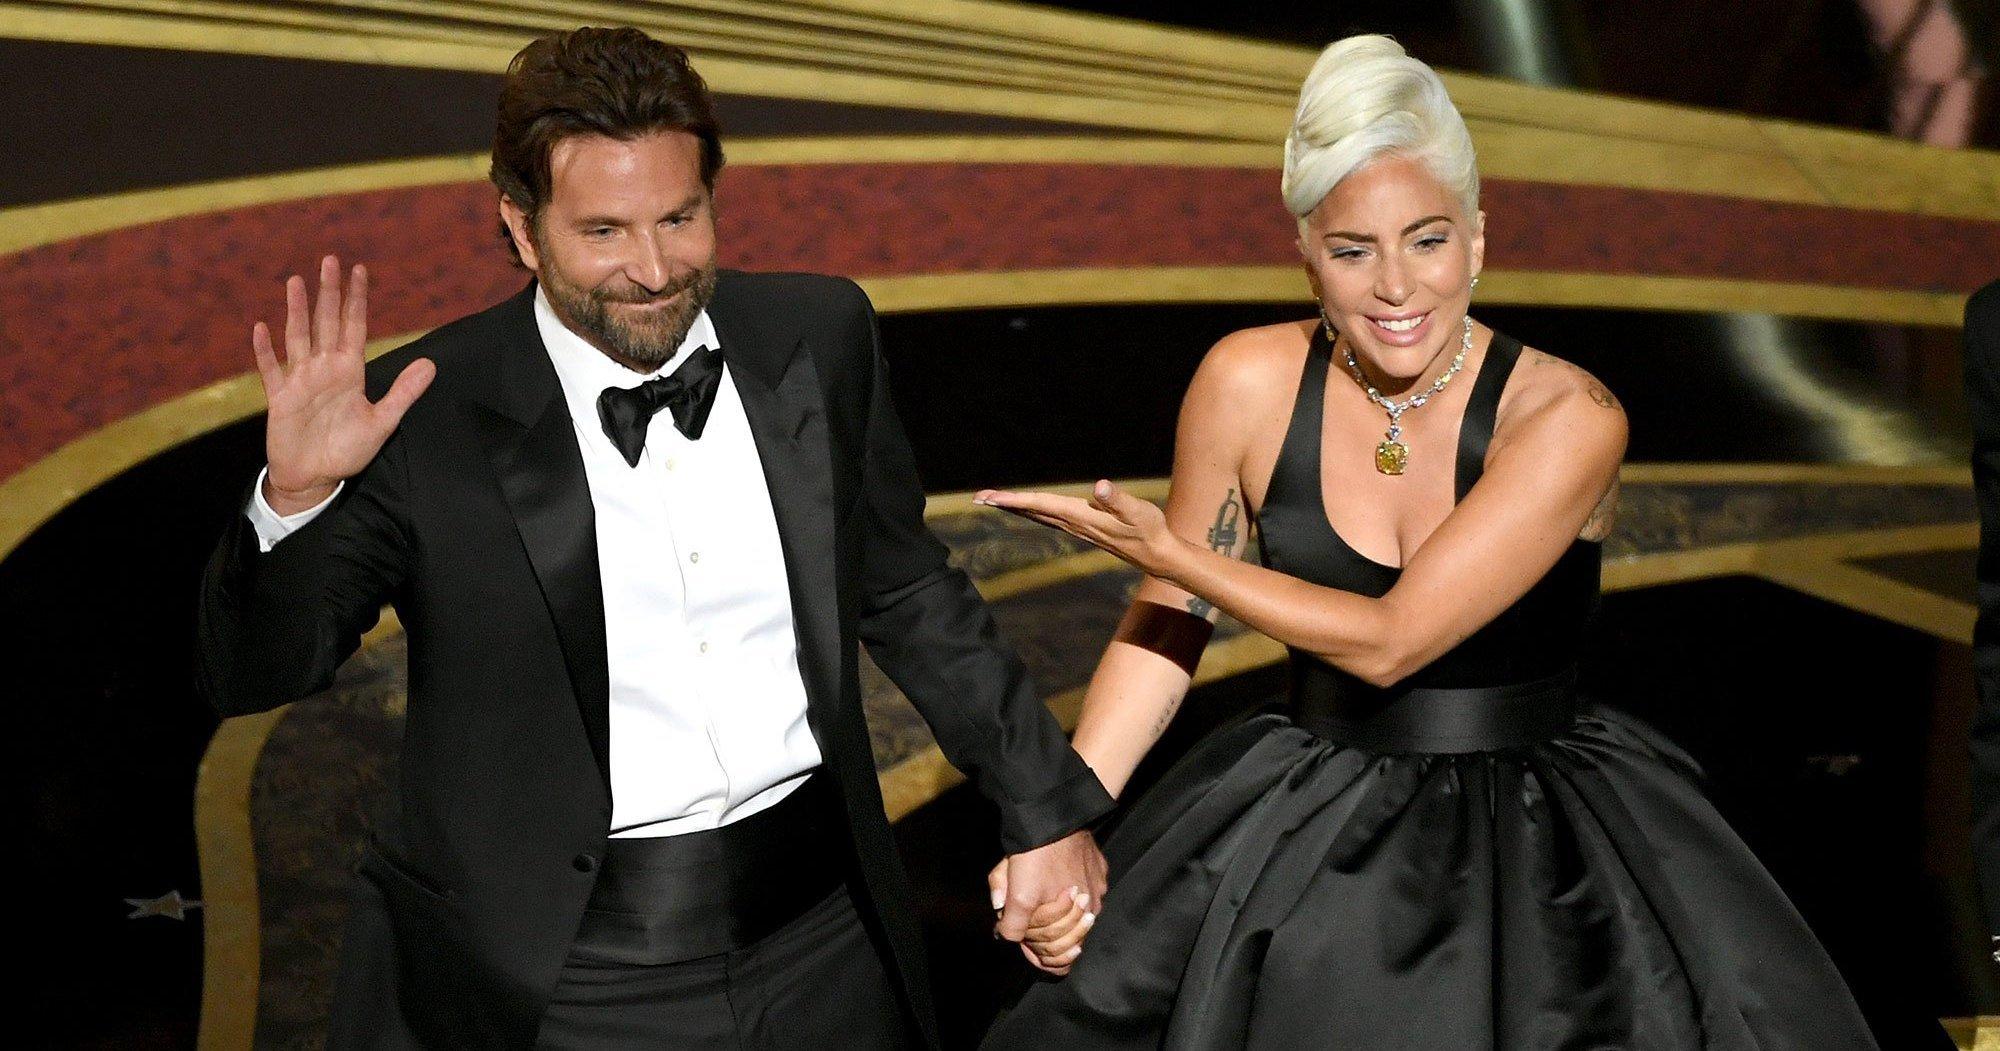 Gaga! J. Lo! Us Weekly Breaks Down the Best of the 2019 Oscars